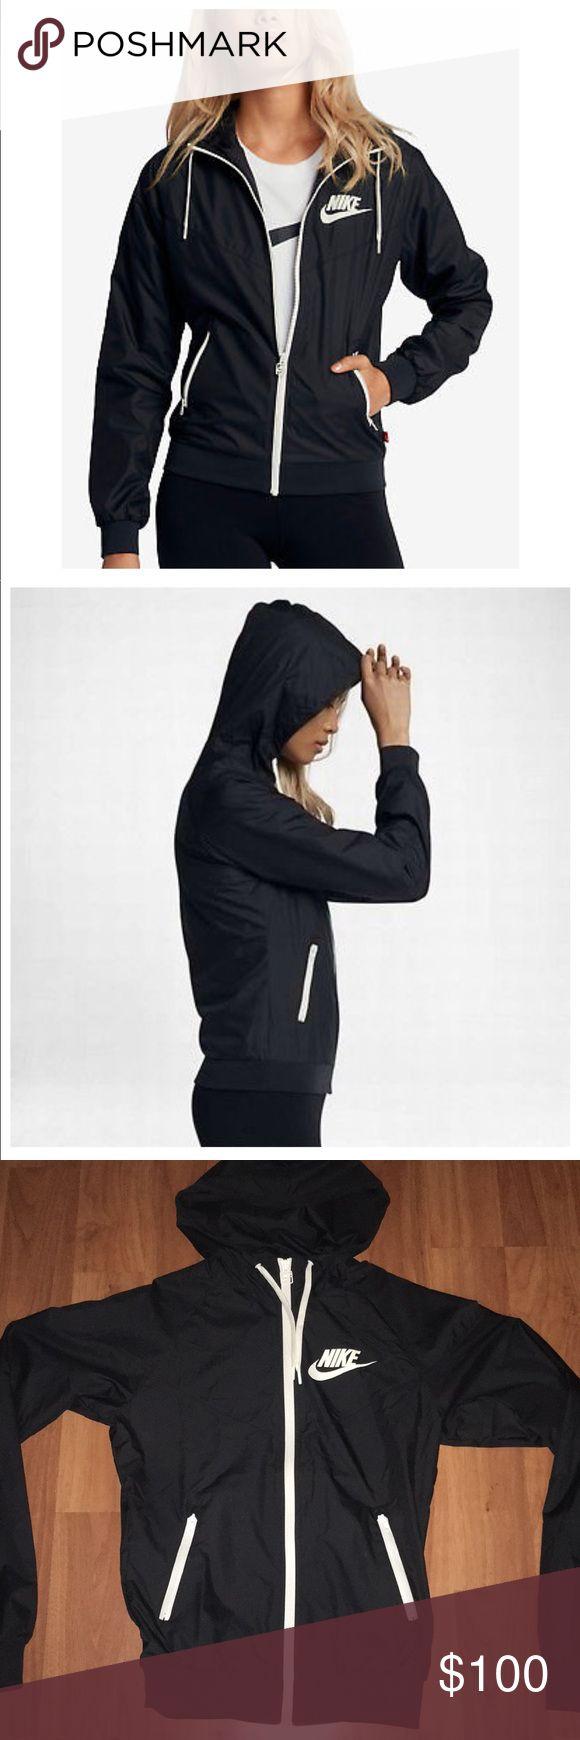 Nike Windrunner Original😍 Size xs, never worn. Nike windrunner jacket in black with white accents. NWOT Nike Tops Sweatshirts & Hoodies